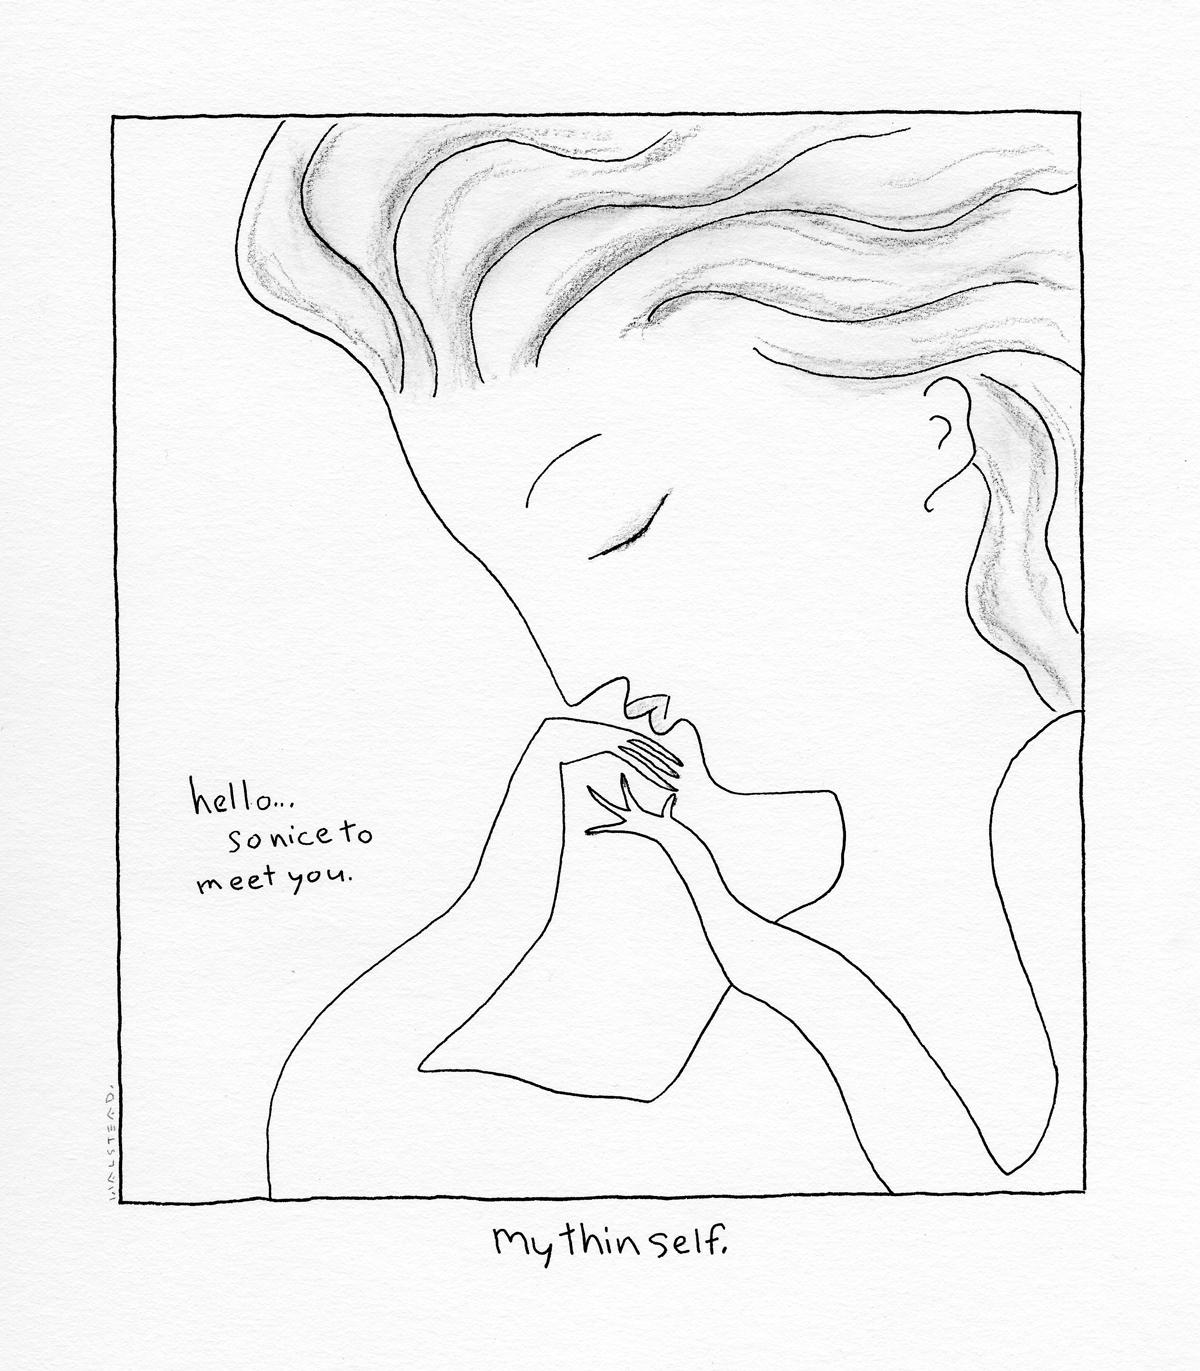 virginiahalstead.com/Drawings/My-thin-self.png